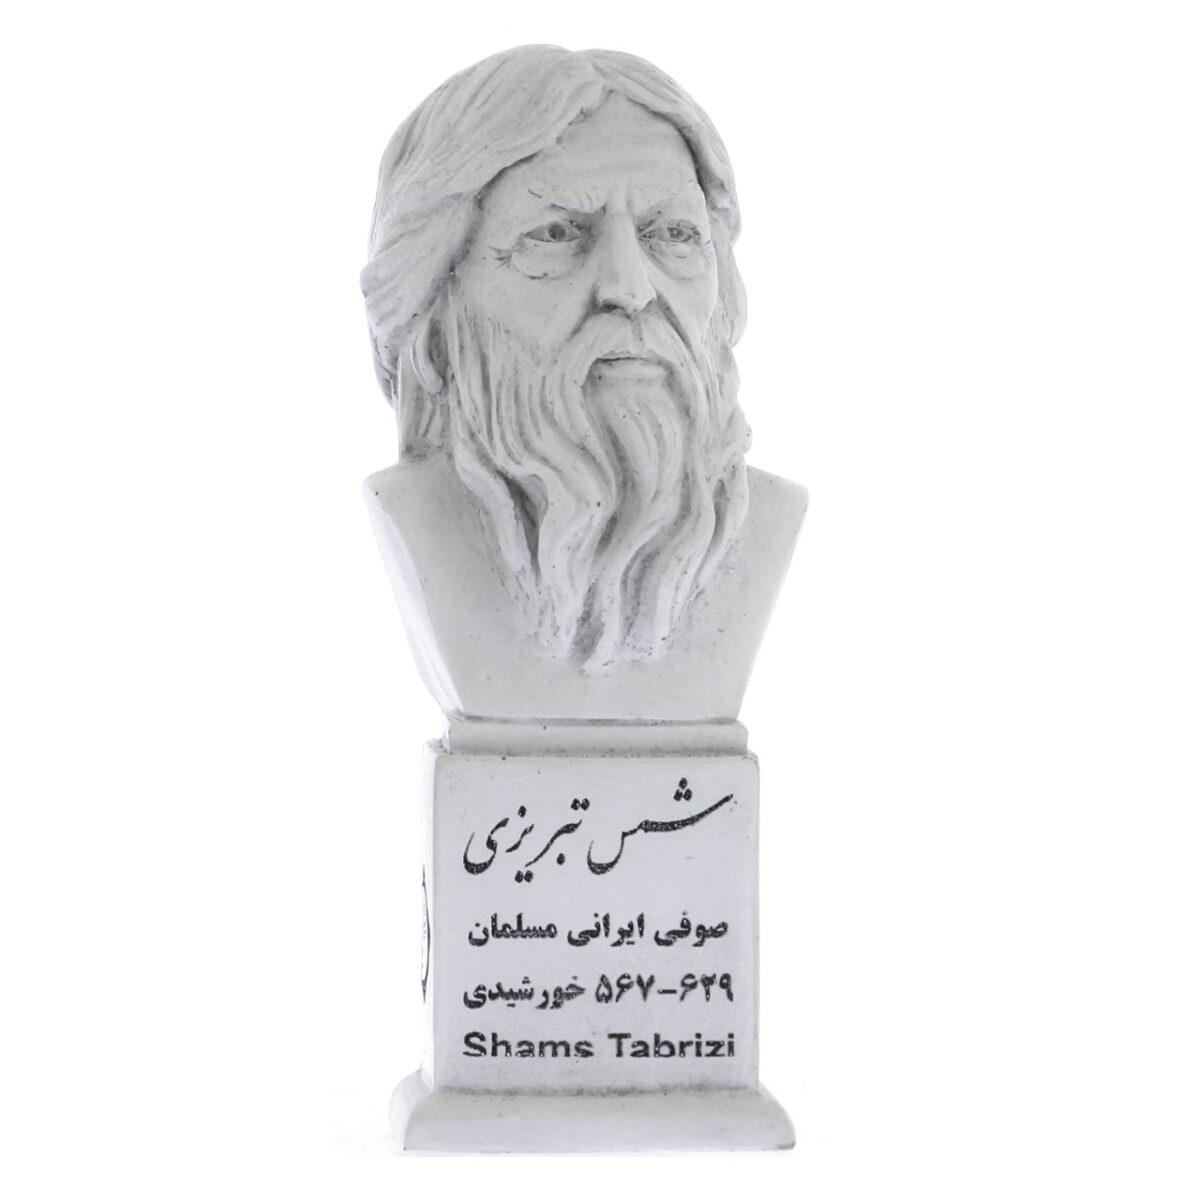 shams tabrizi s 1200x1200 - سردیس شمس تبریزی